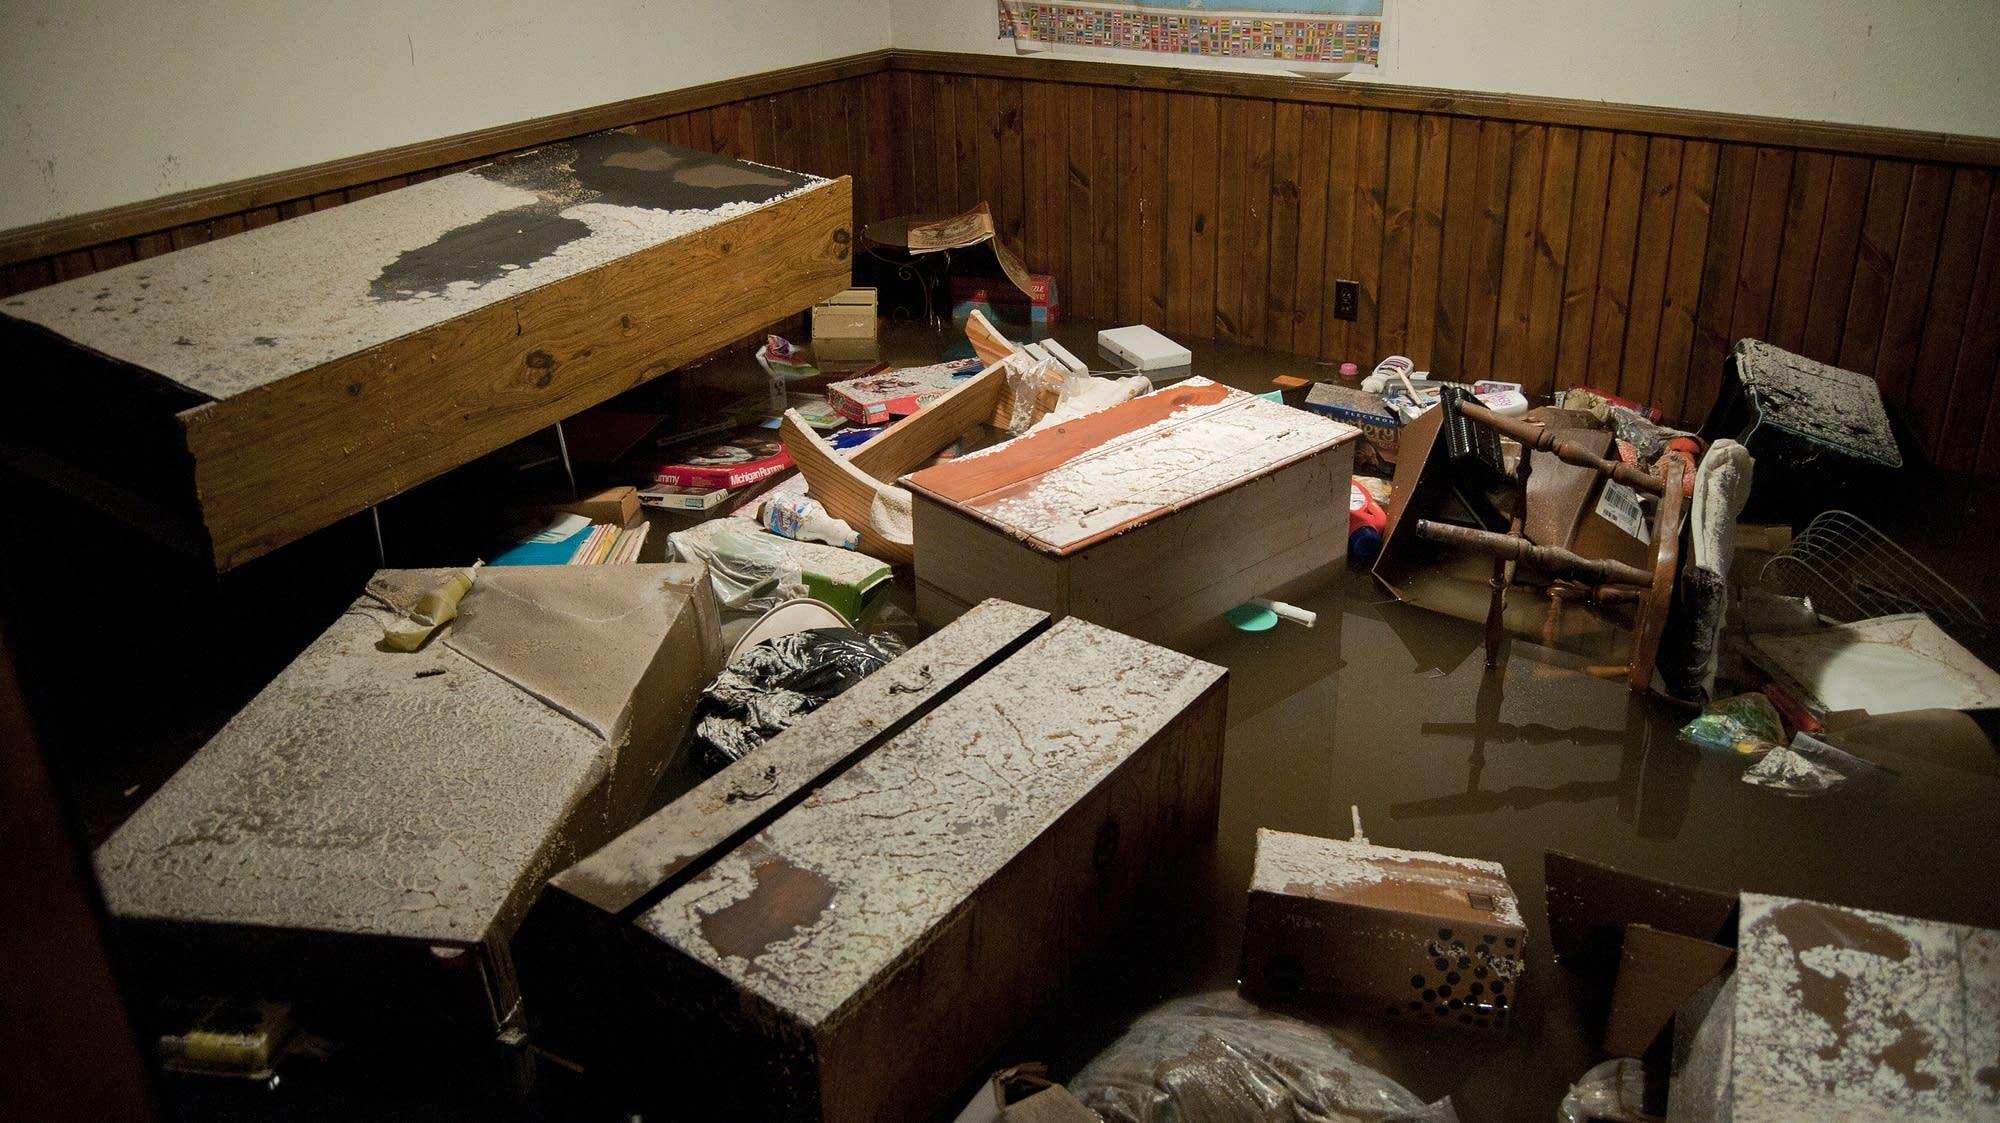 Items float in Sheryl Gutfleisch's basement.